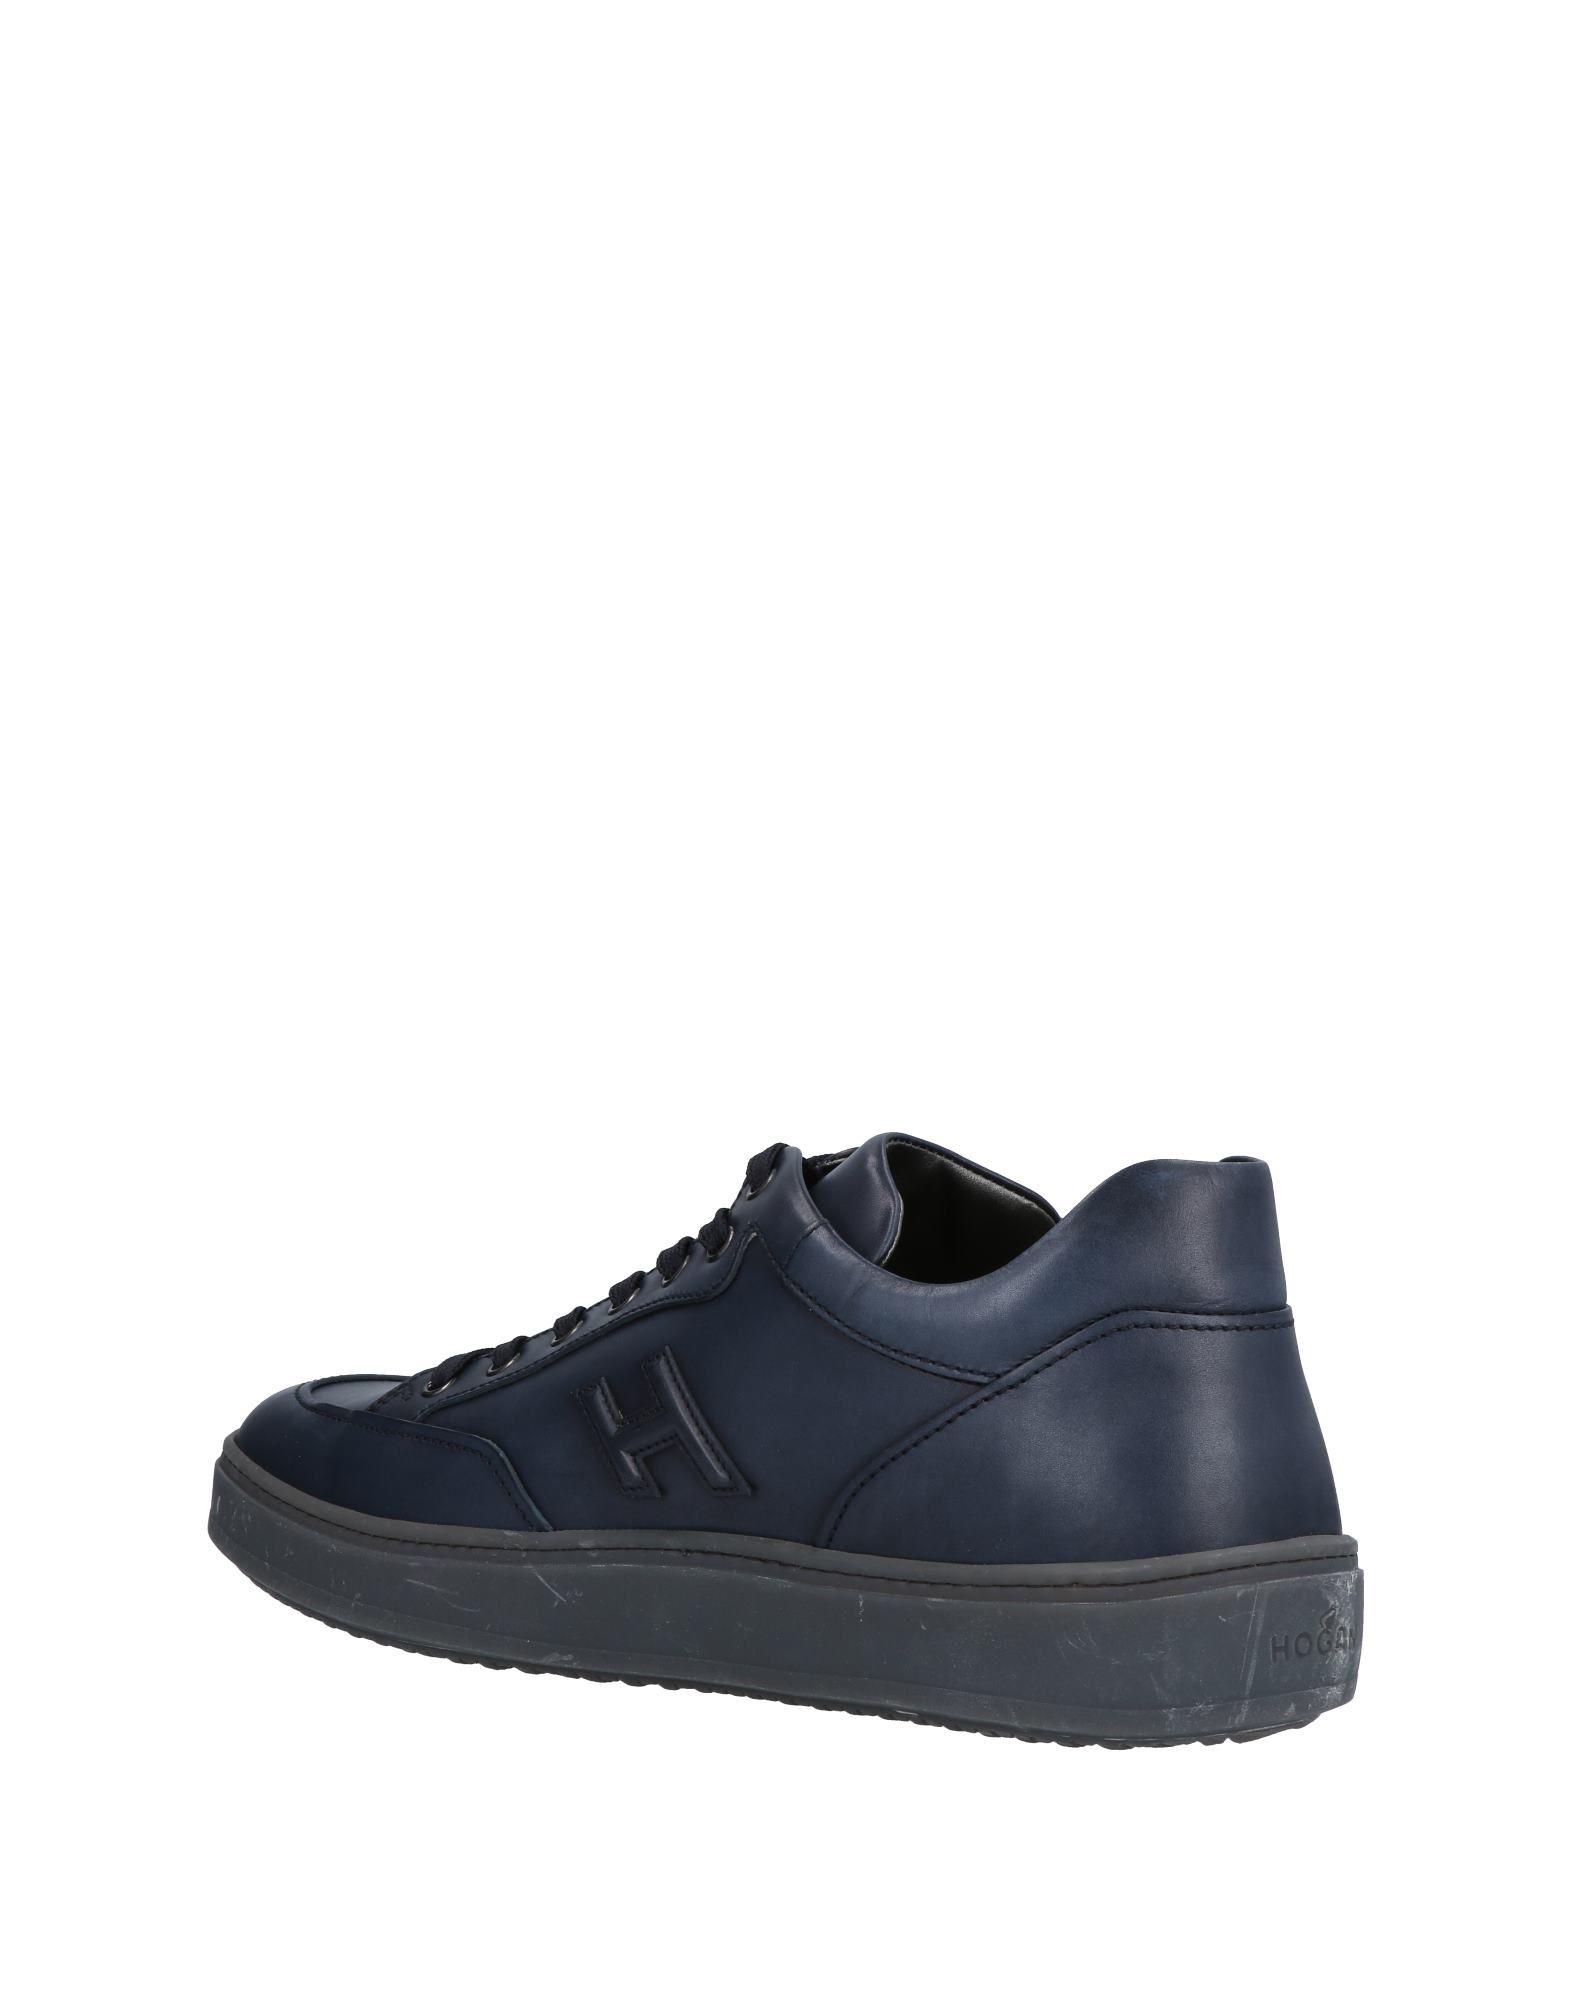 Hogan Sneakers Qualität Herren  11243261LO Gute Qualität Sneakers beliebte Schuhe e8f8bf